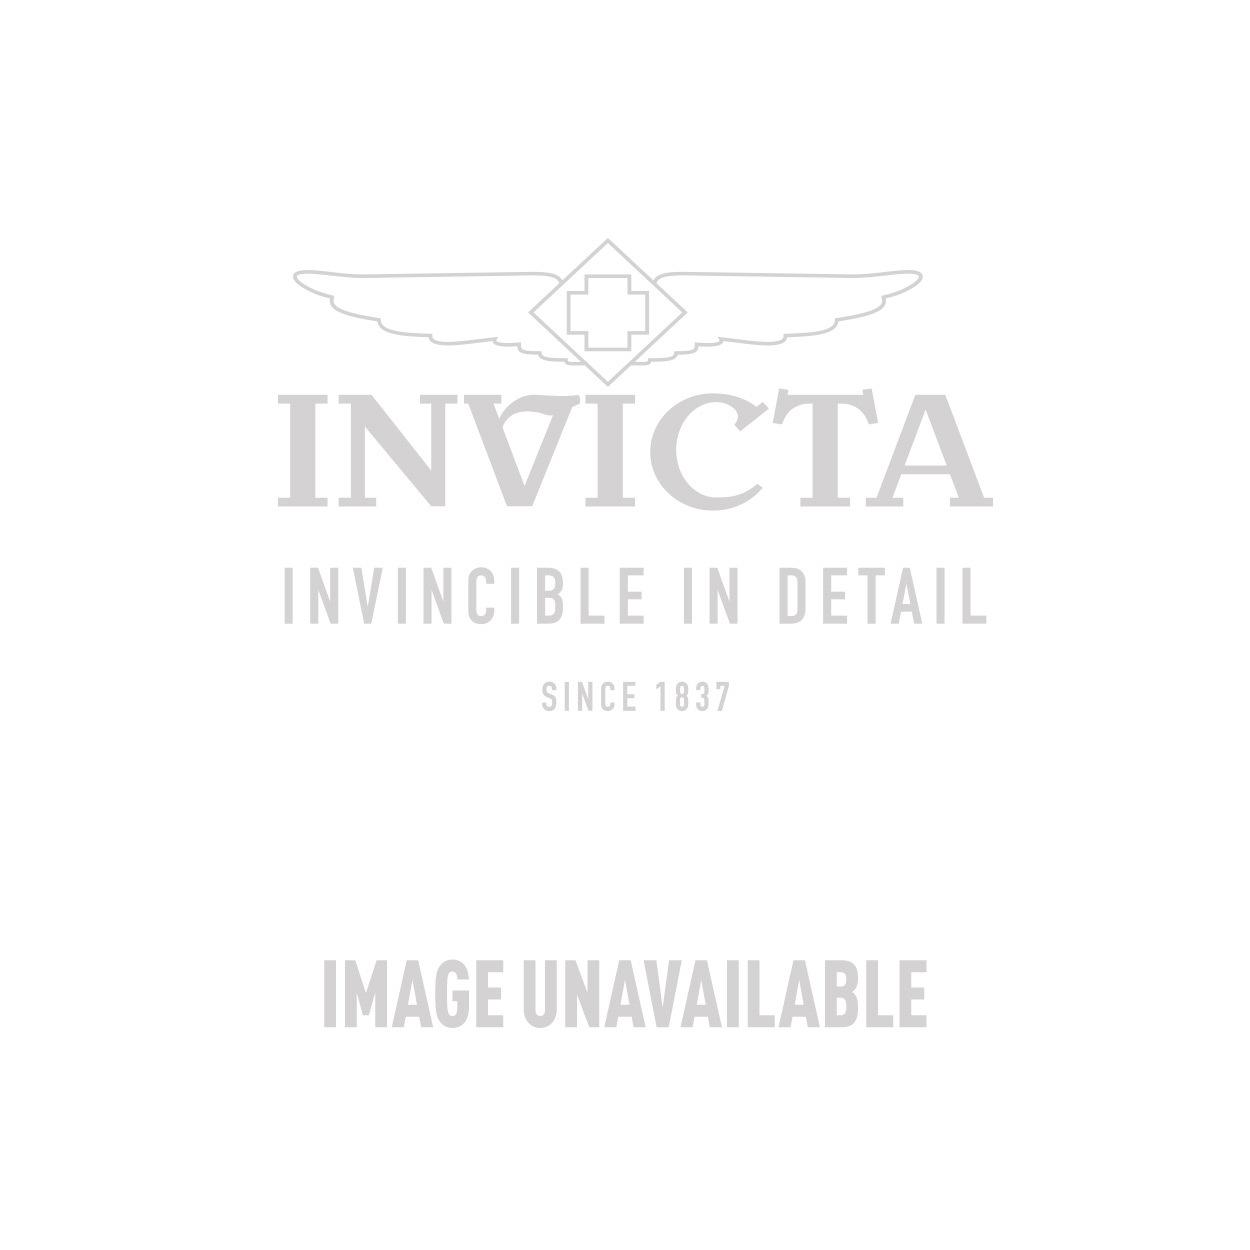 Invicta Subaqua Mens Quartz 50mm Black Case Black Dial - Model 20221